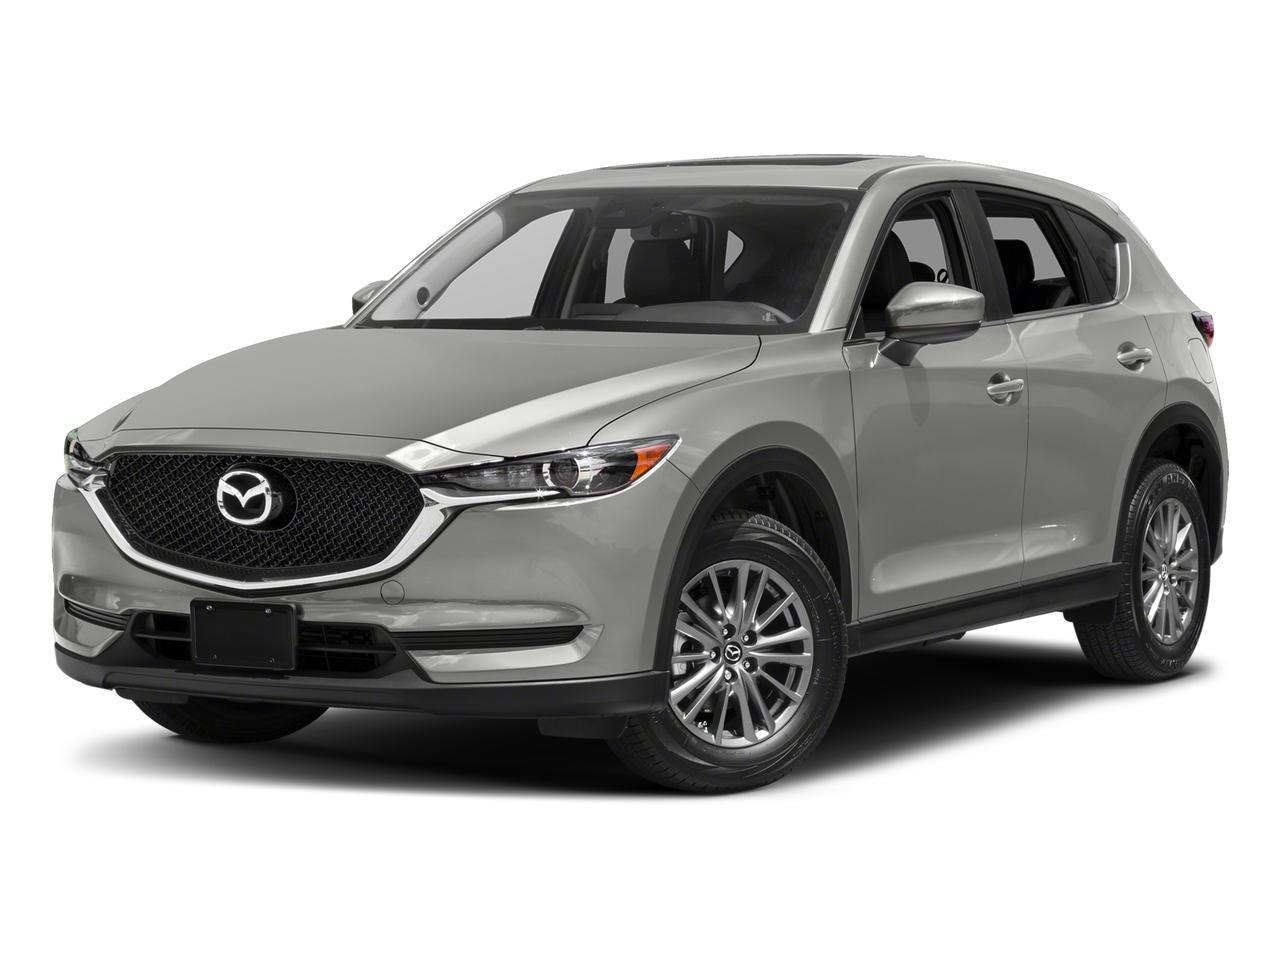 2017 Mazda CX-5 Vehicle Photo in Pleasanton, CA 94588